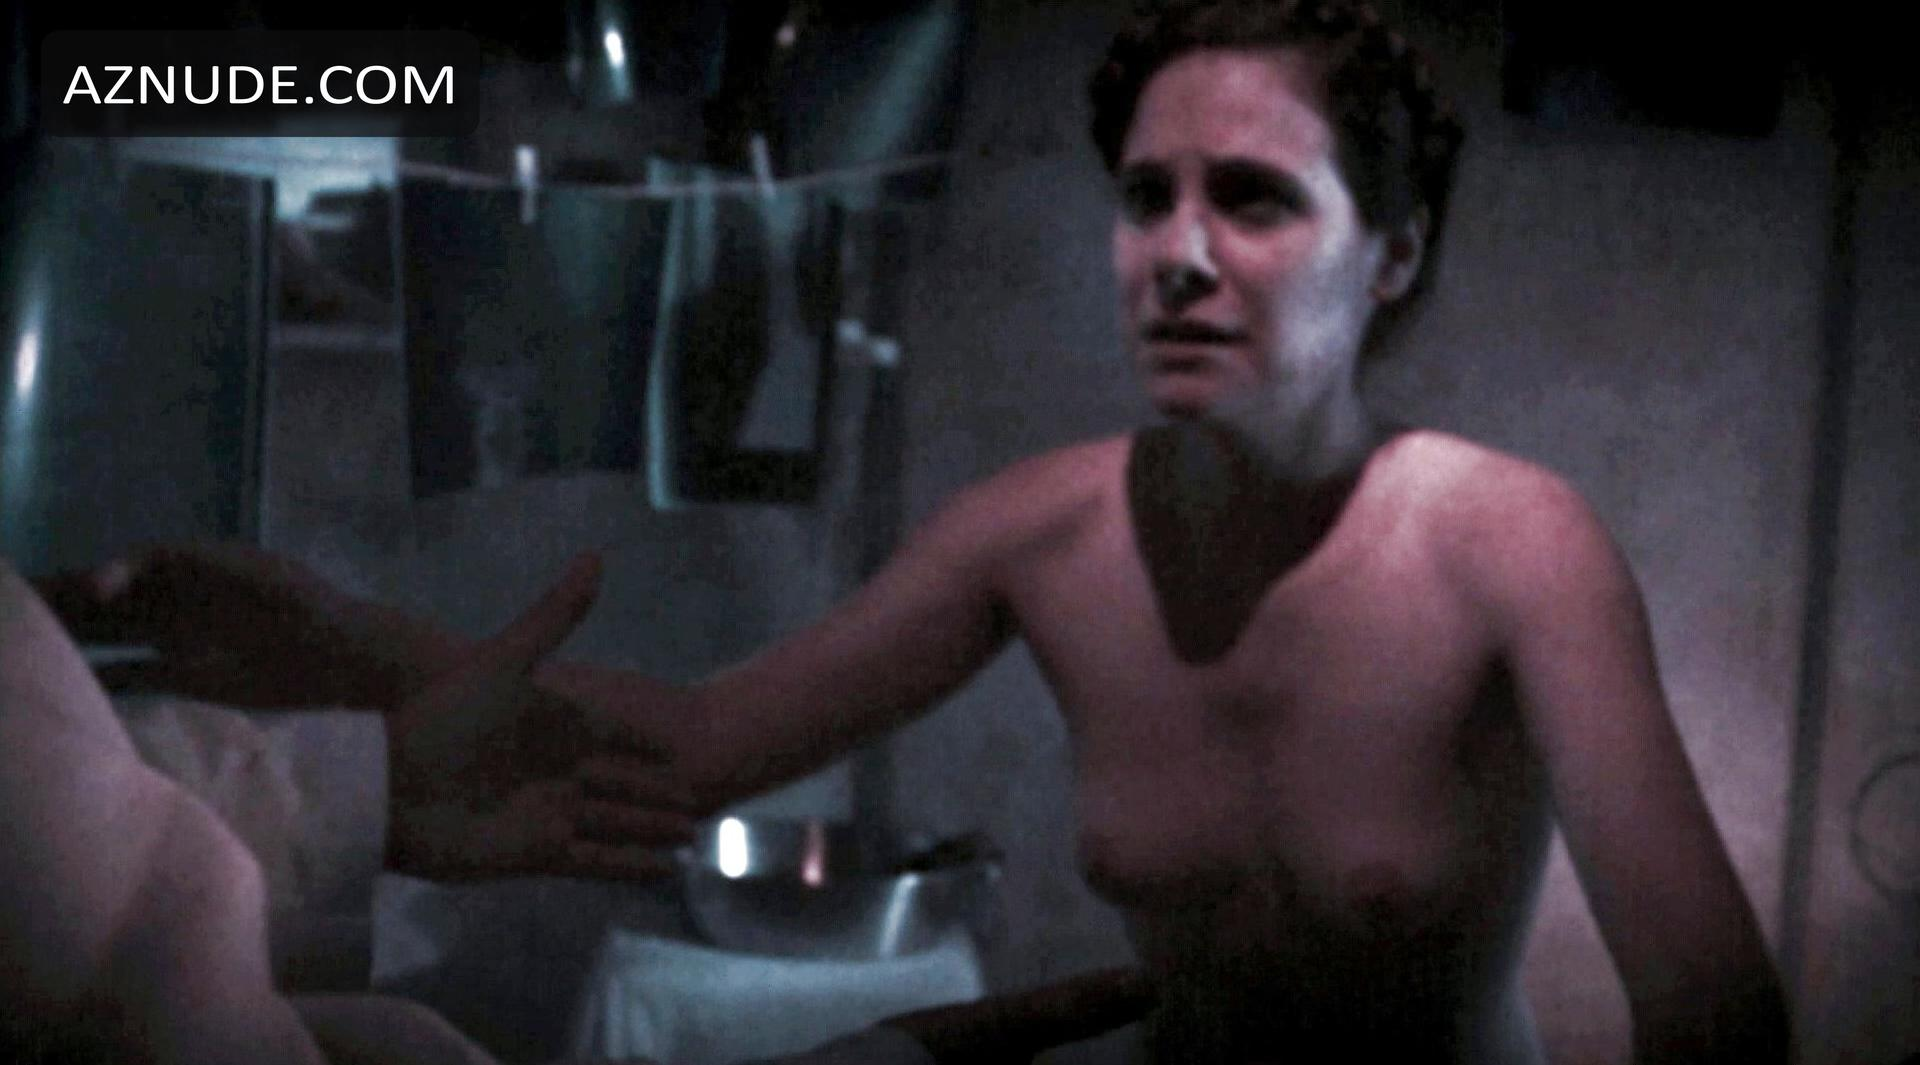 from Todd caroline dhavernas bikini naked